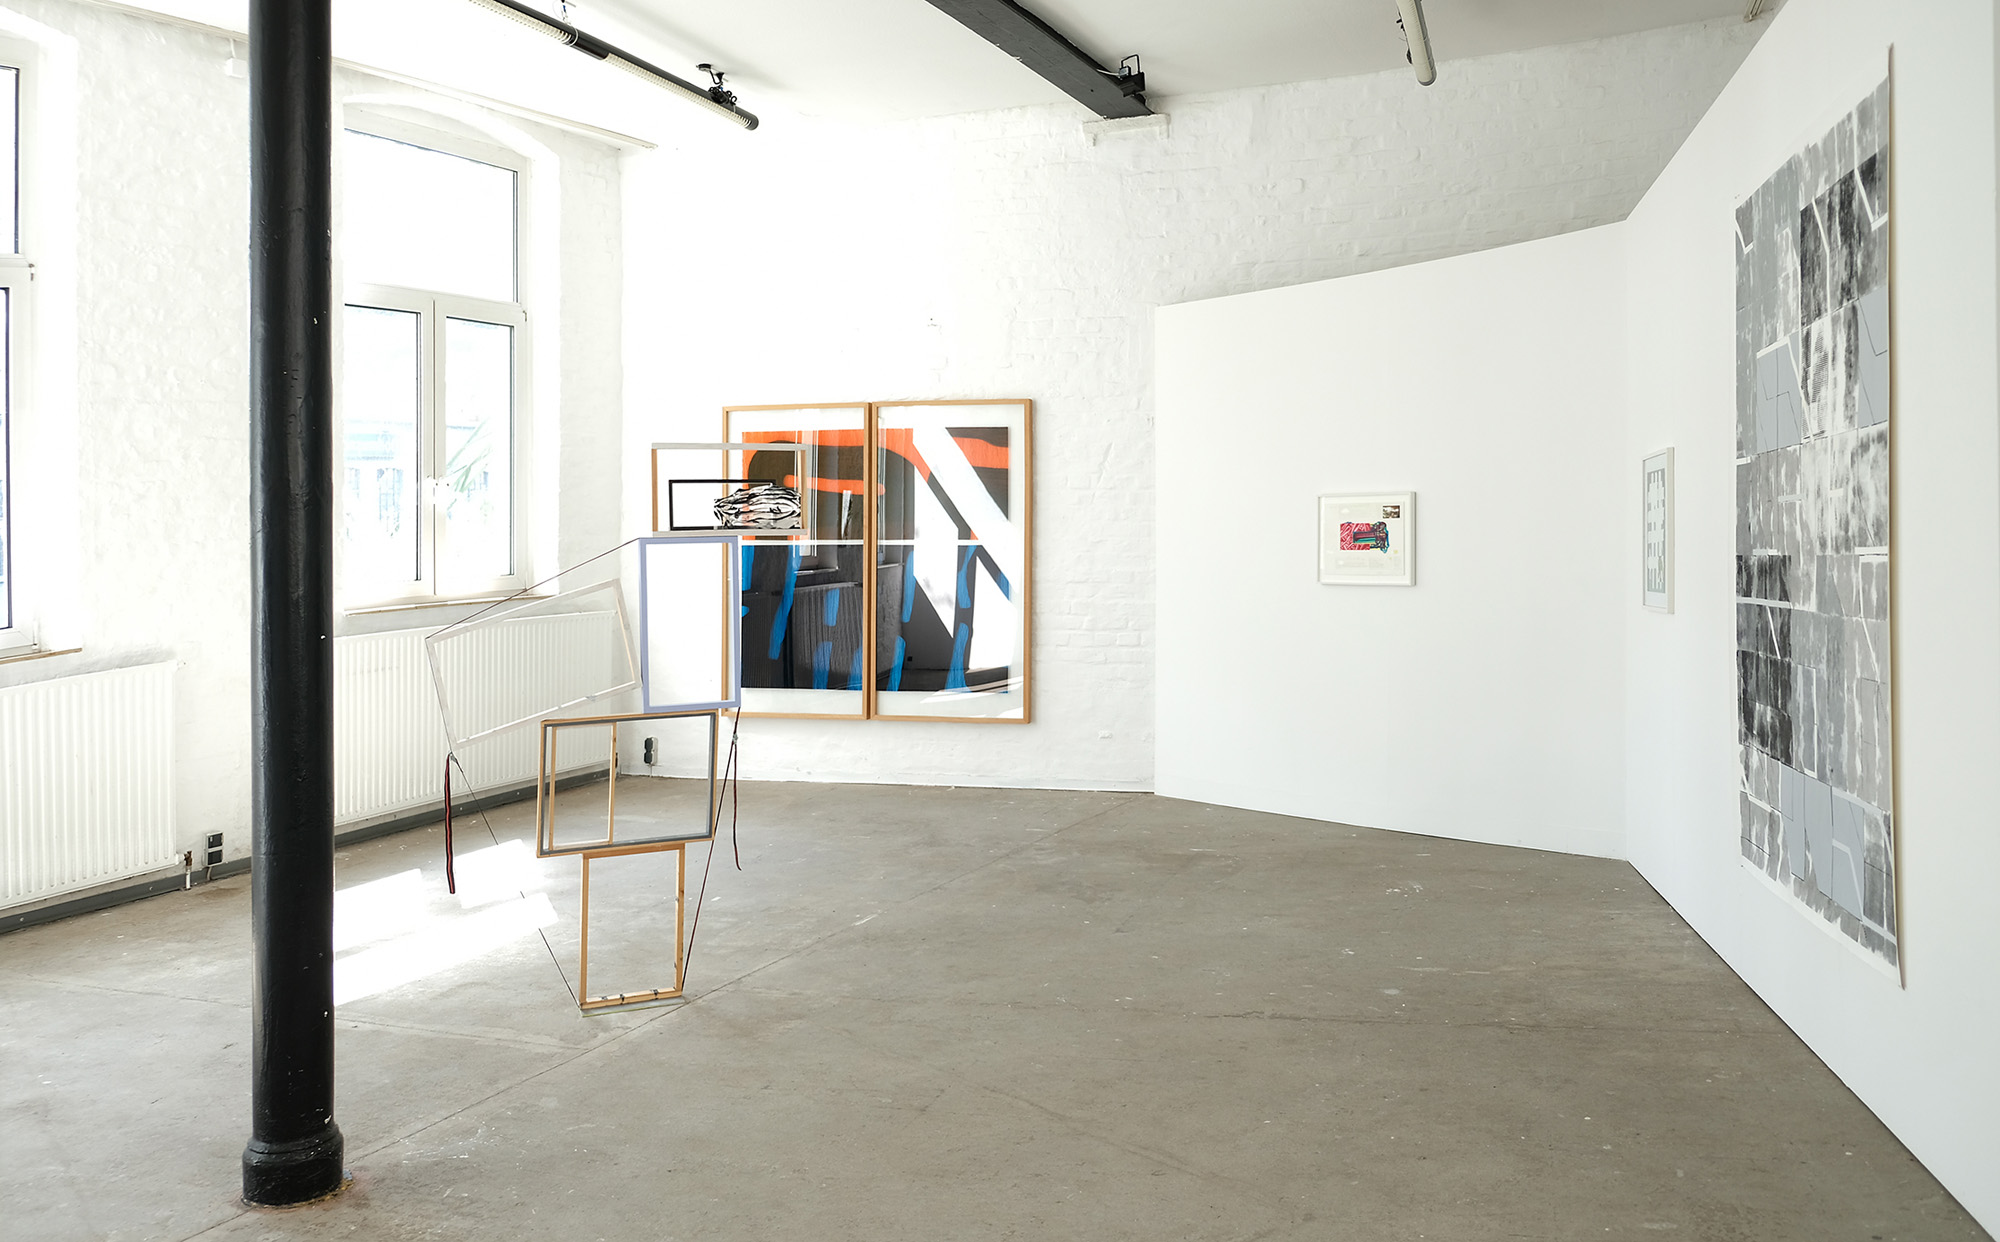 Jost Münster, woodframes, glass, tension belt